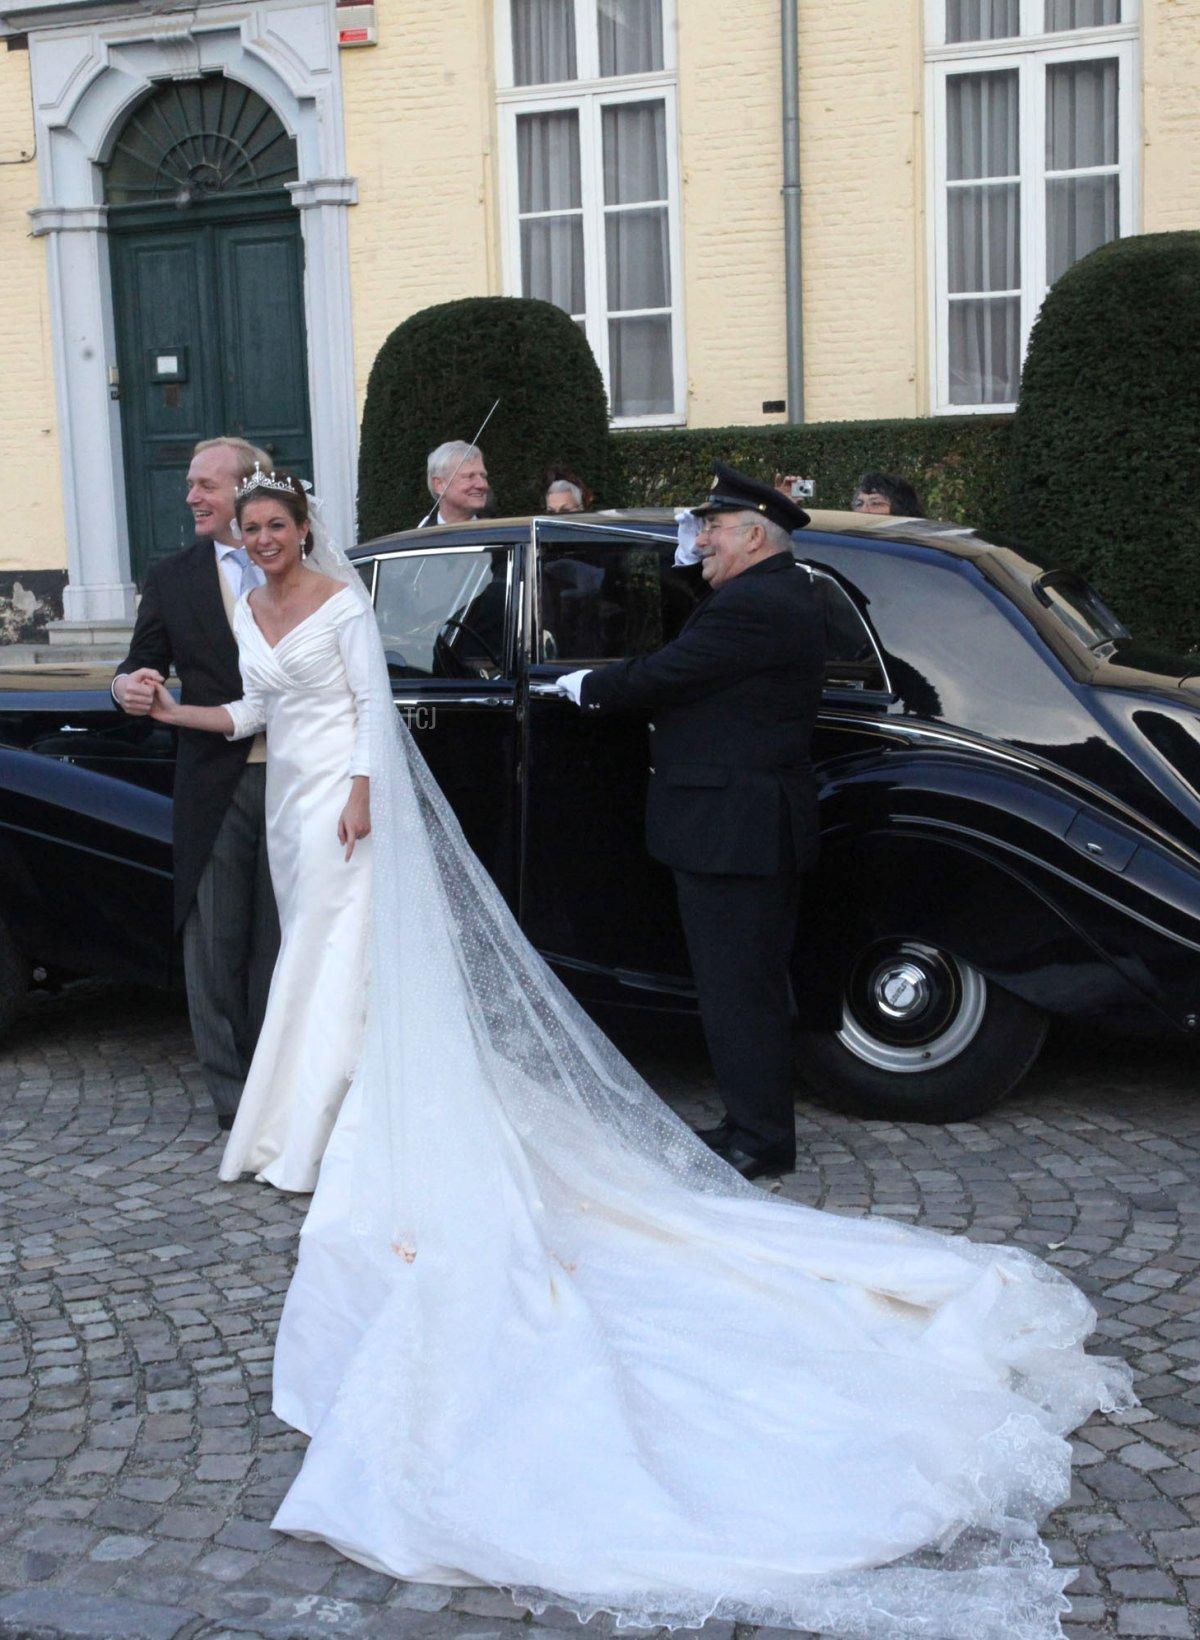 Annemarie Gualtherie van Weezel and Prince Carlos de Bourbon de Parme's royal wedding in Brussels, November 2010